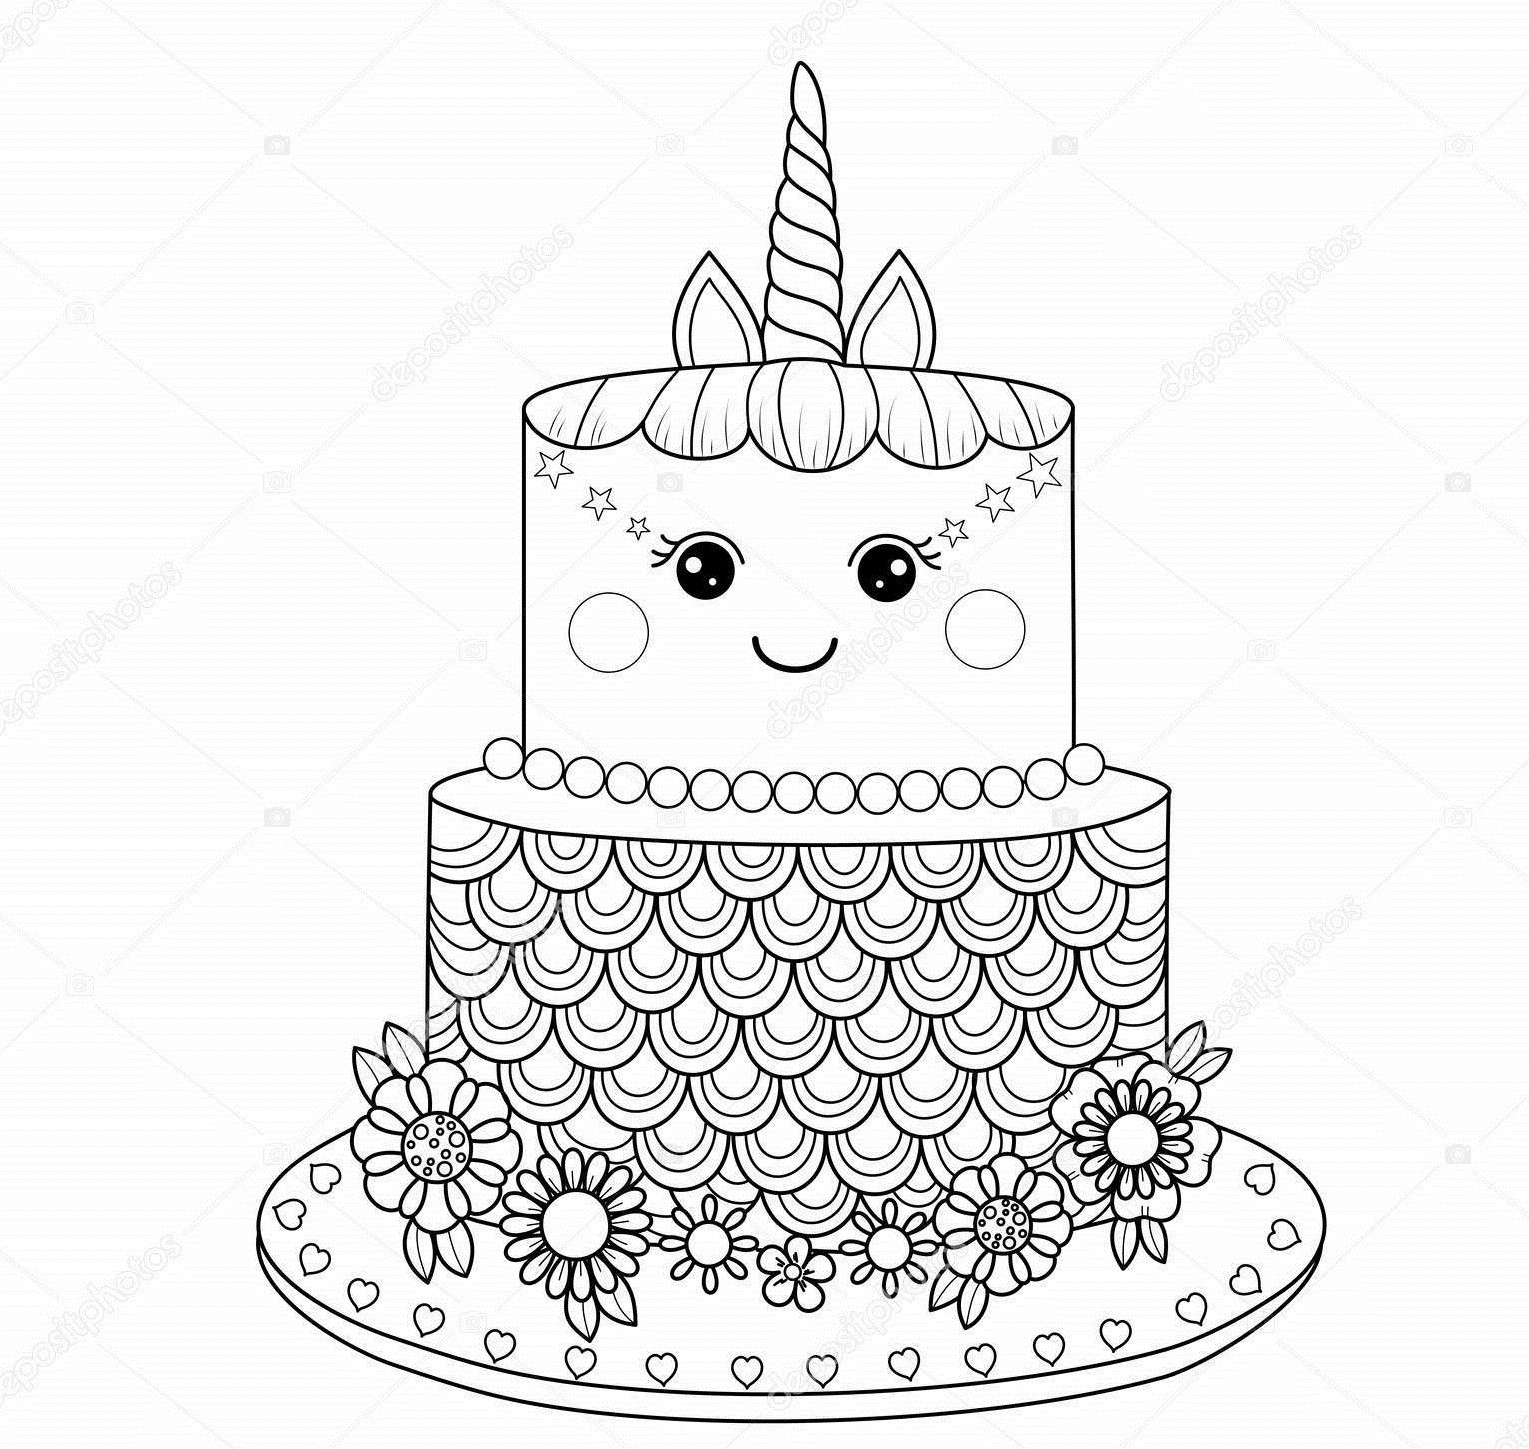 раскраска торт-единорог 100